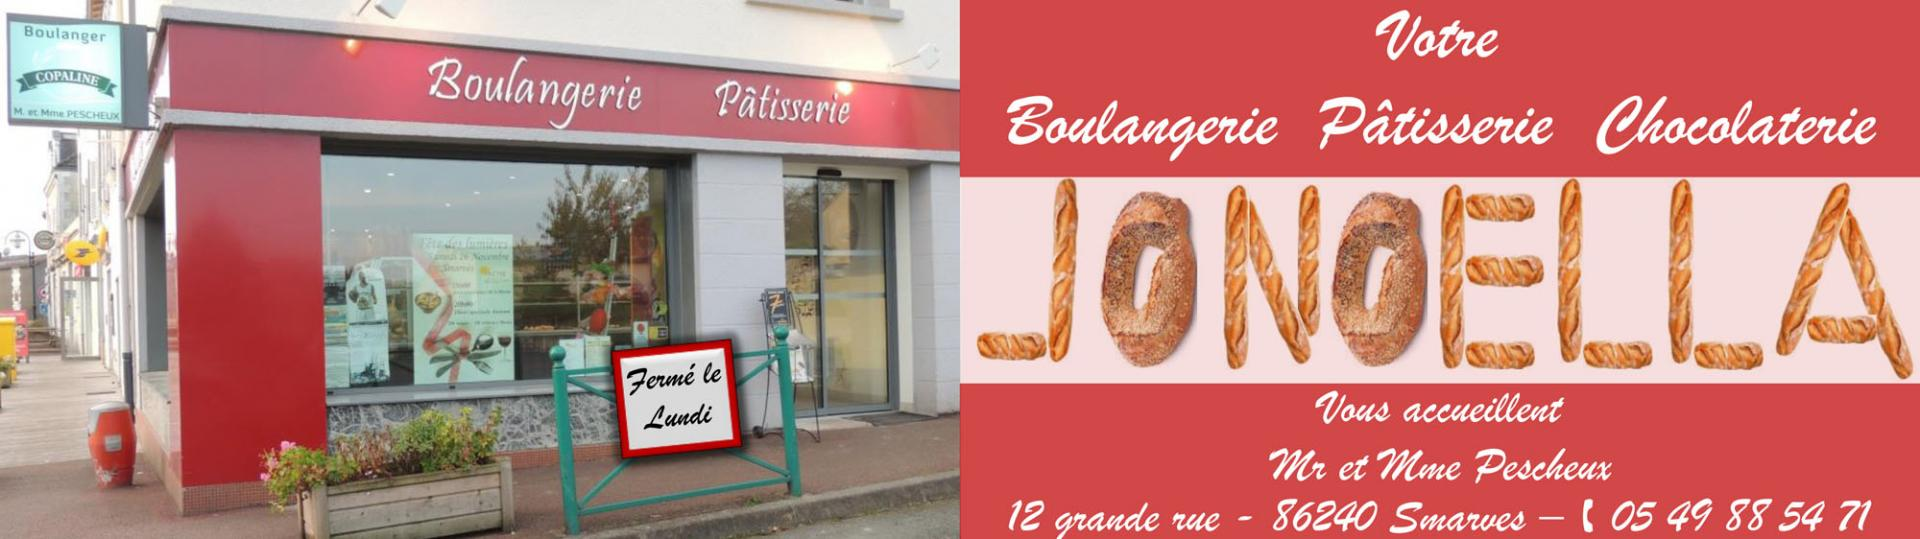 Pub tir boulangerie